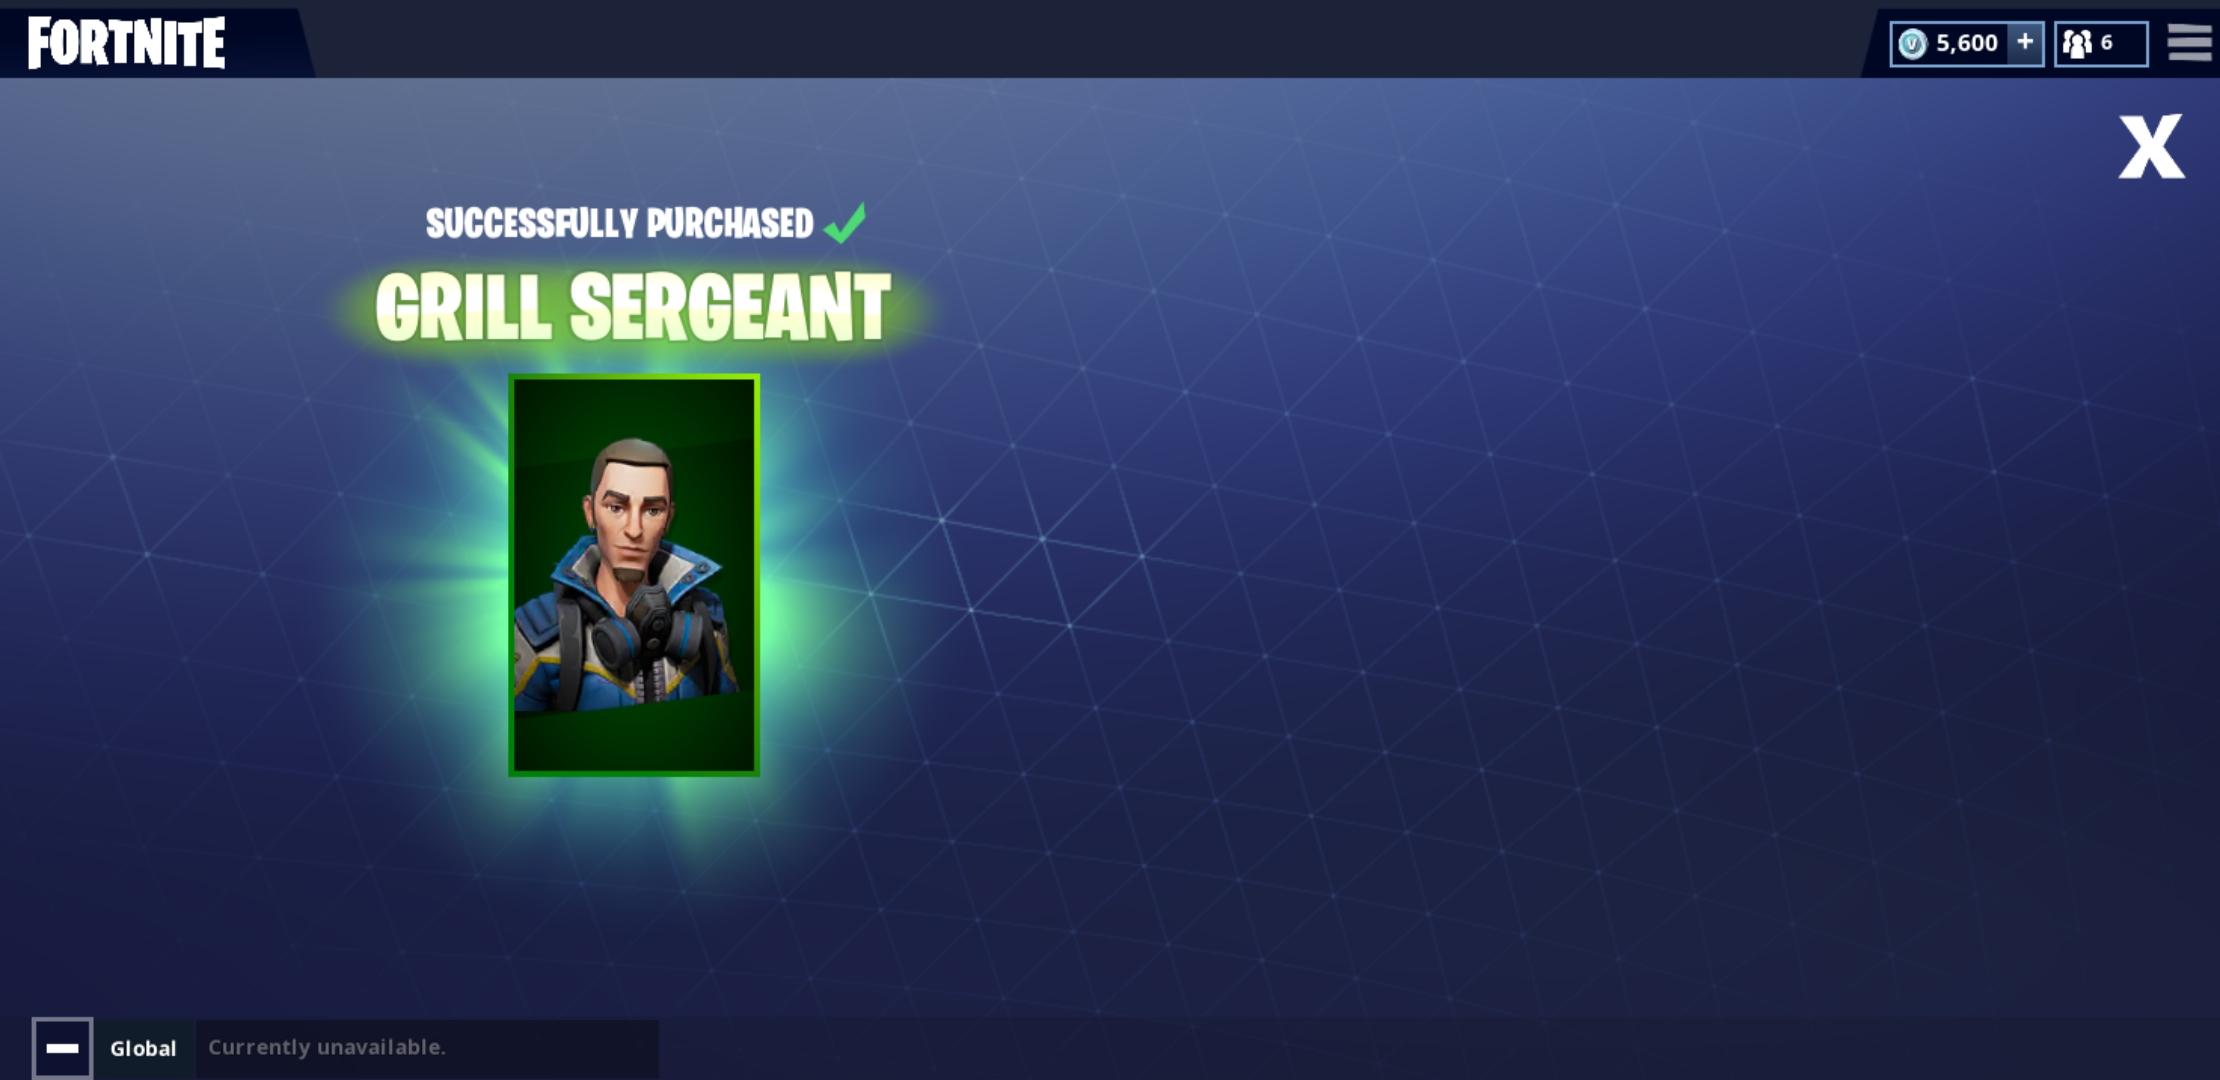 Grill Sergeant / new skin